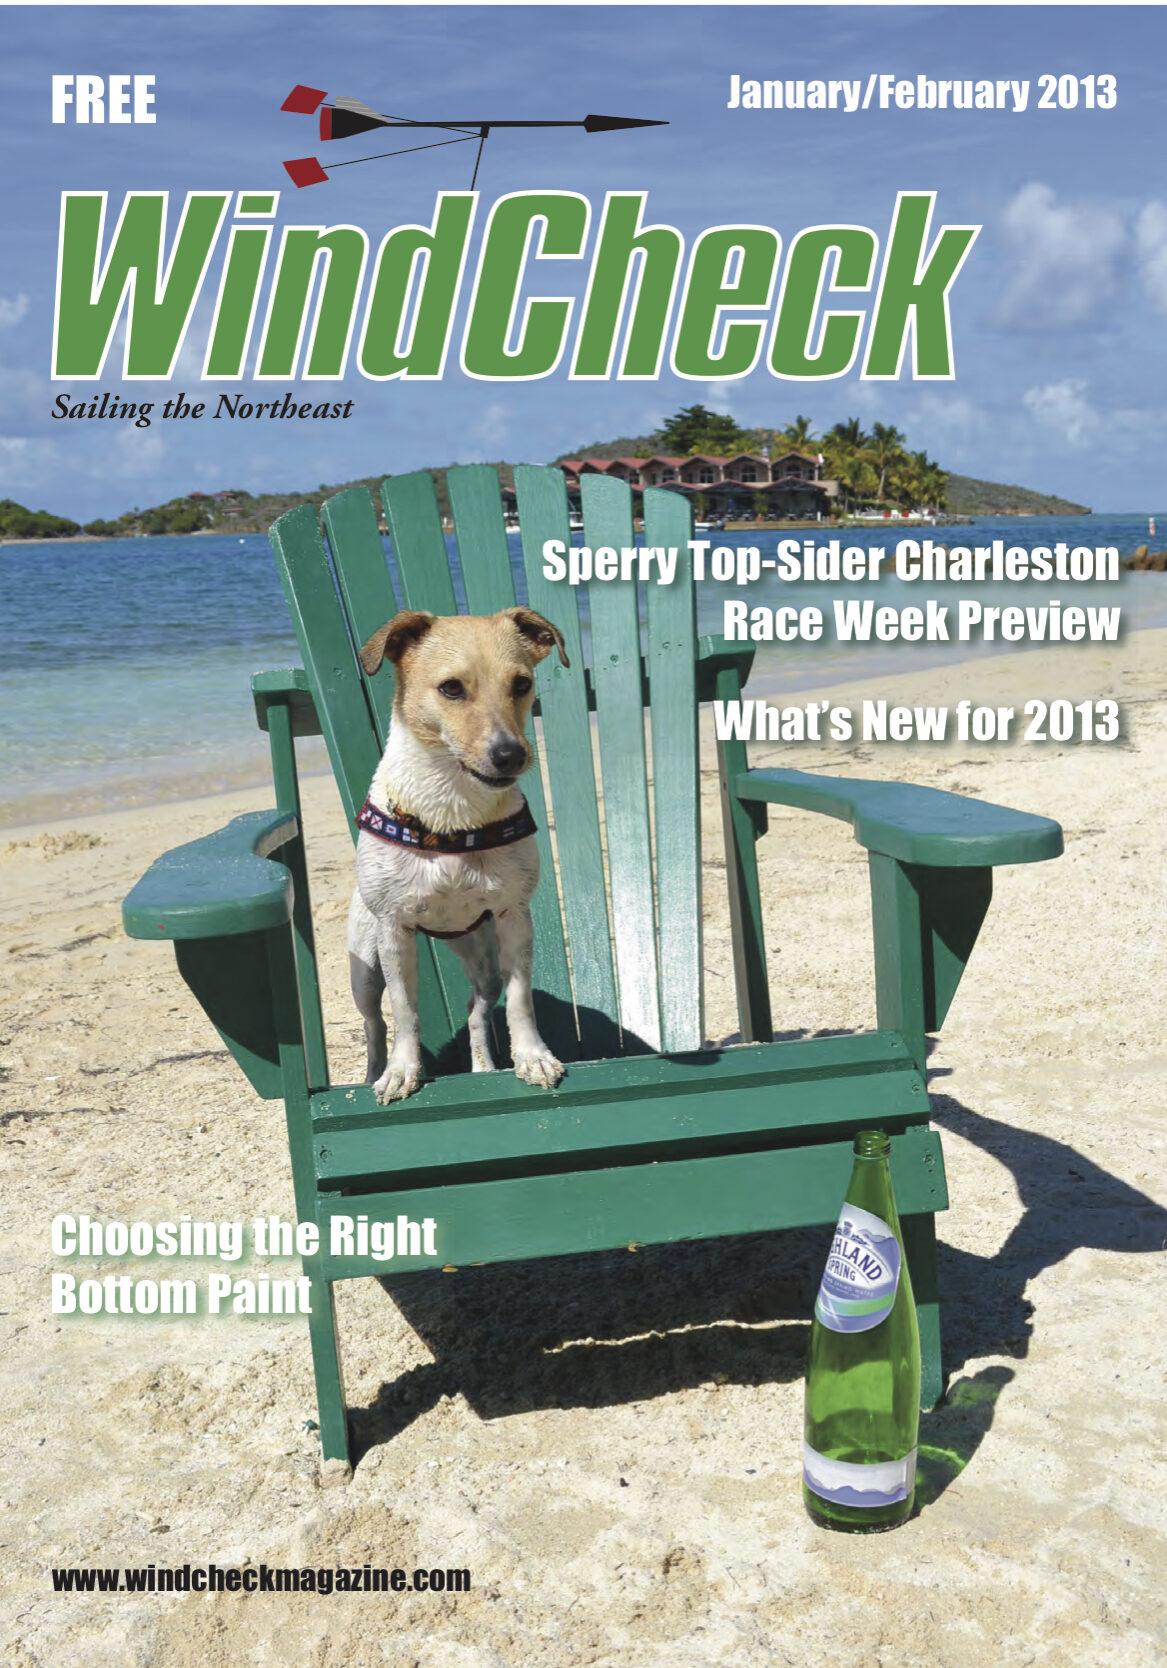 Windcheck Magazine - January/February 2013